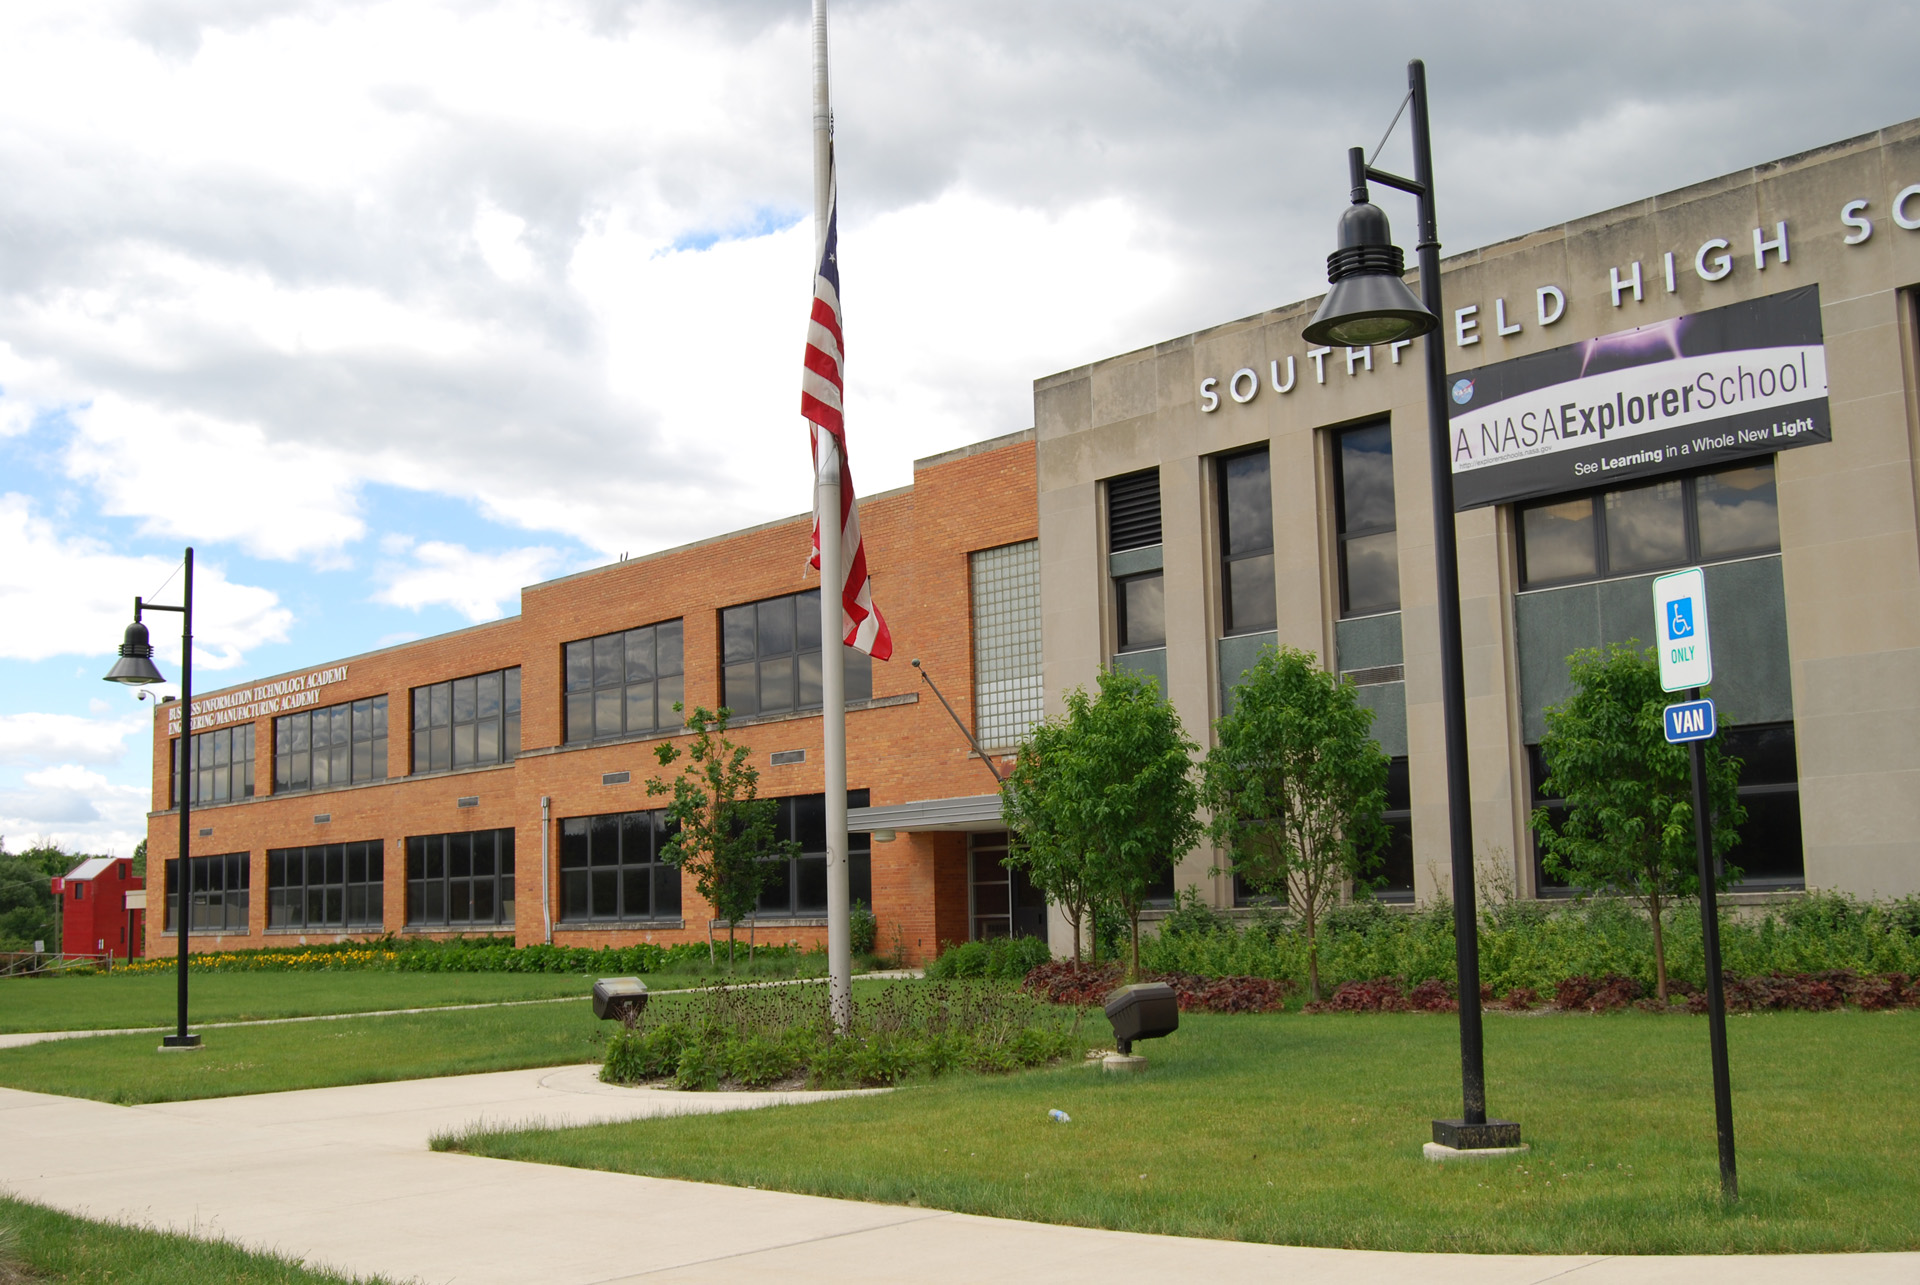 southfield high school addition and renovation